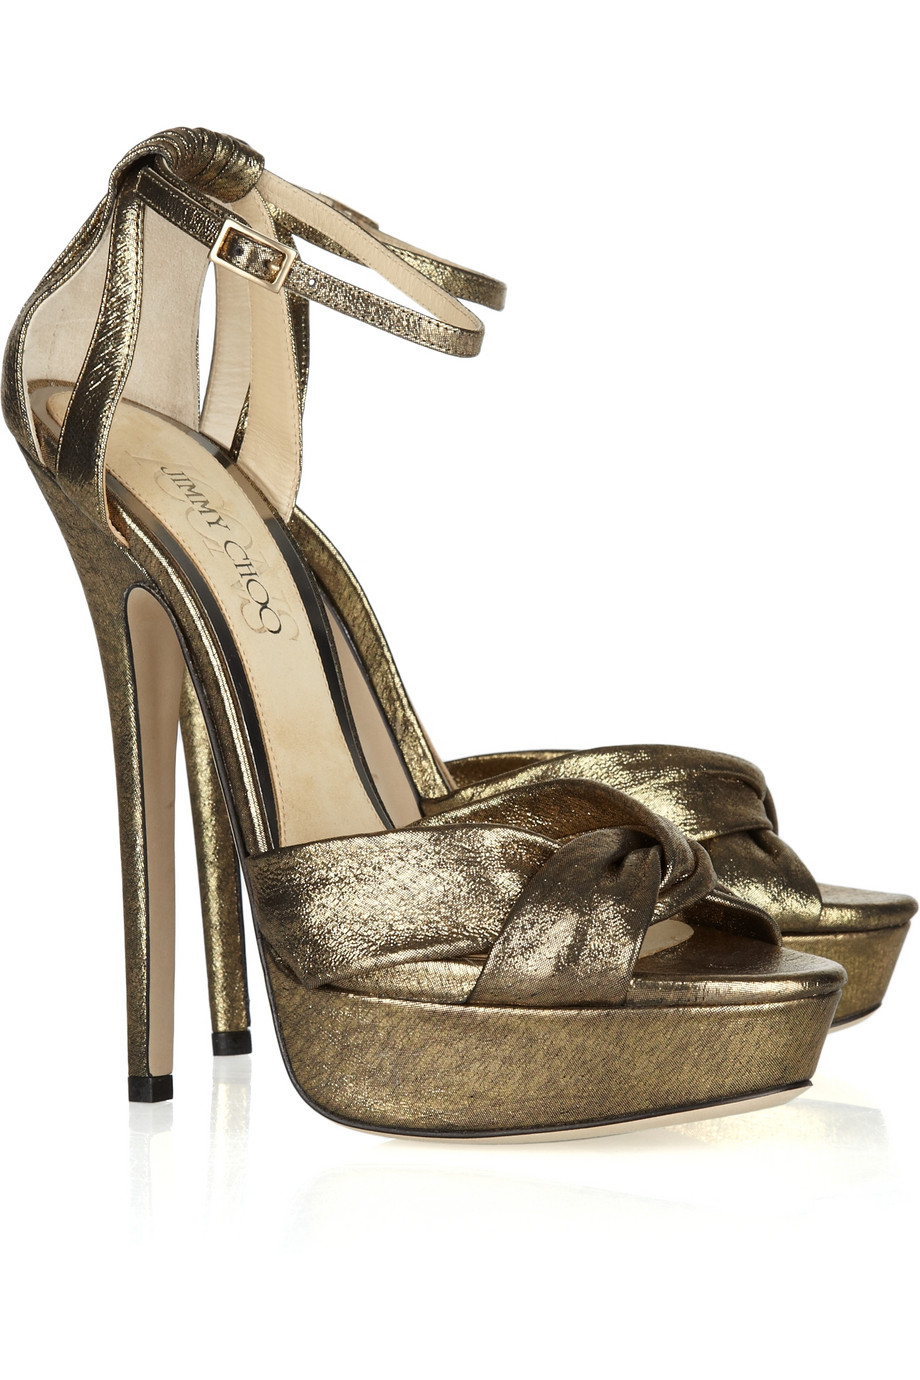 e1d9e6d9152 Jimmy Choo  Kaya  Sandals in Metallic - Lyst